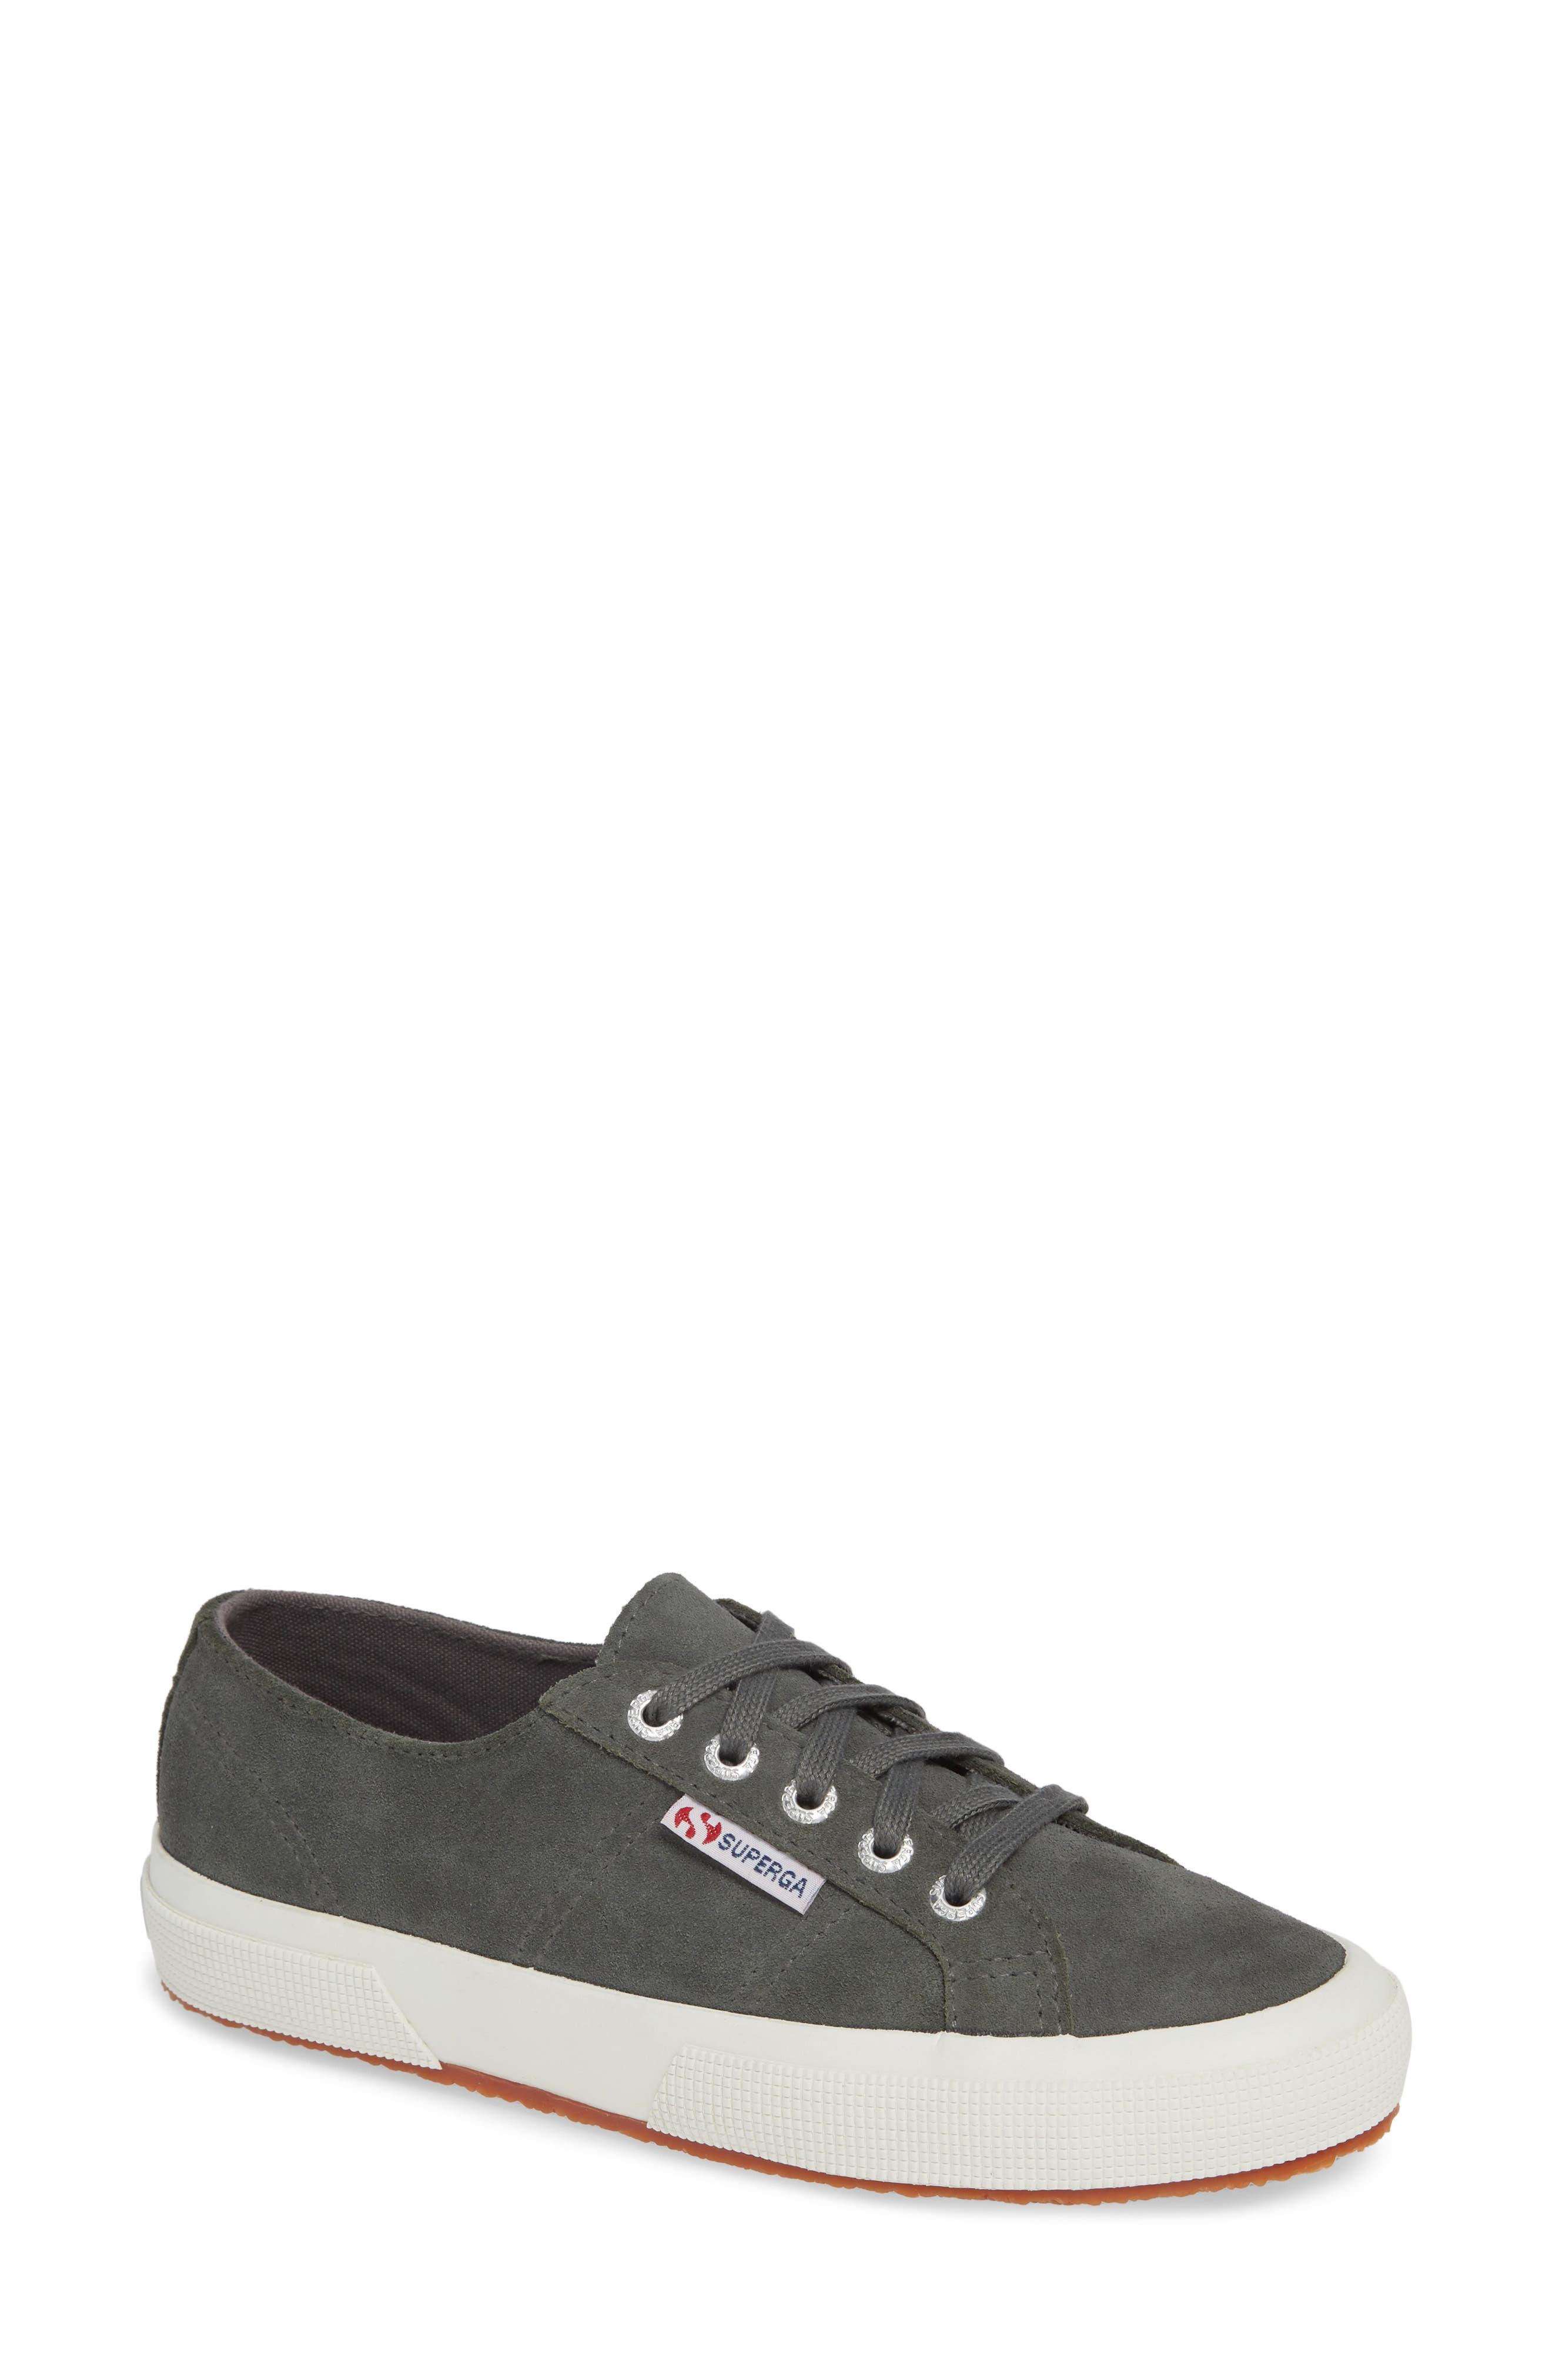 2750 Suecotw Low Top Sneaker,                             Main thumbnail 1, color,                             DARK GREY SUEDE